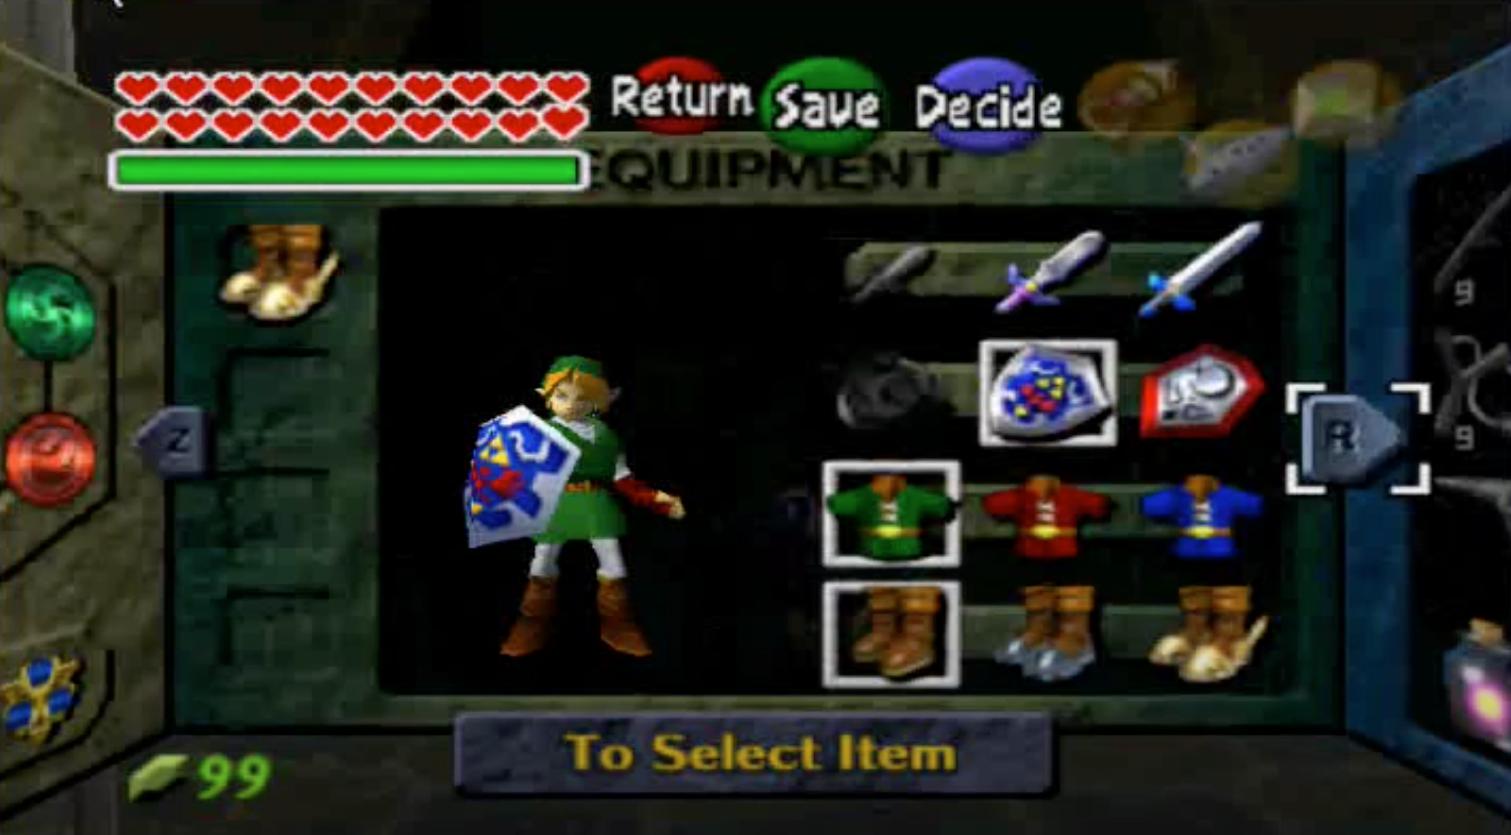 Screenshot 2020 11 11 at 12.10.26 e1605096672879 20 Of The Weirdest Video Game Glitches